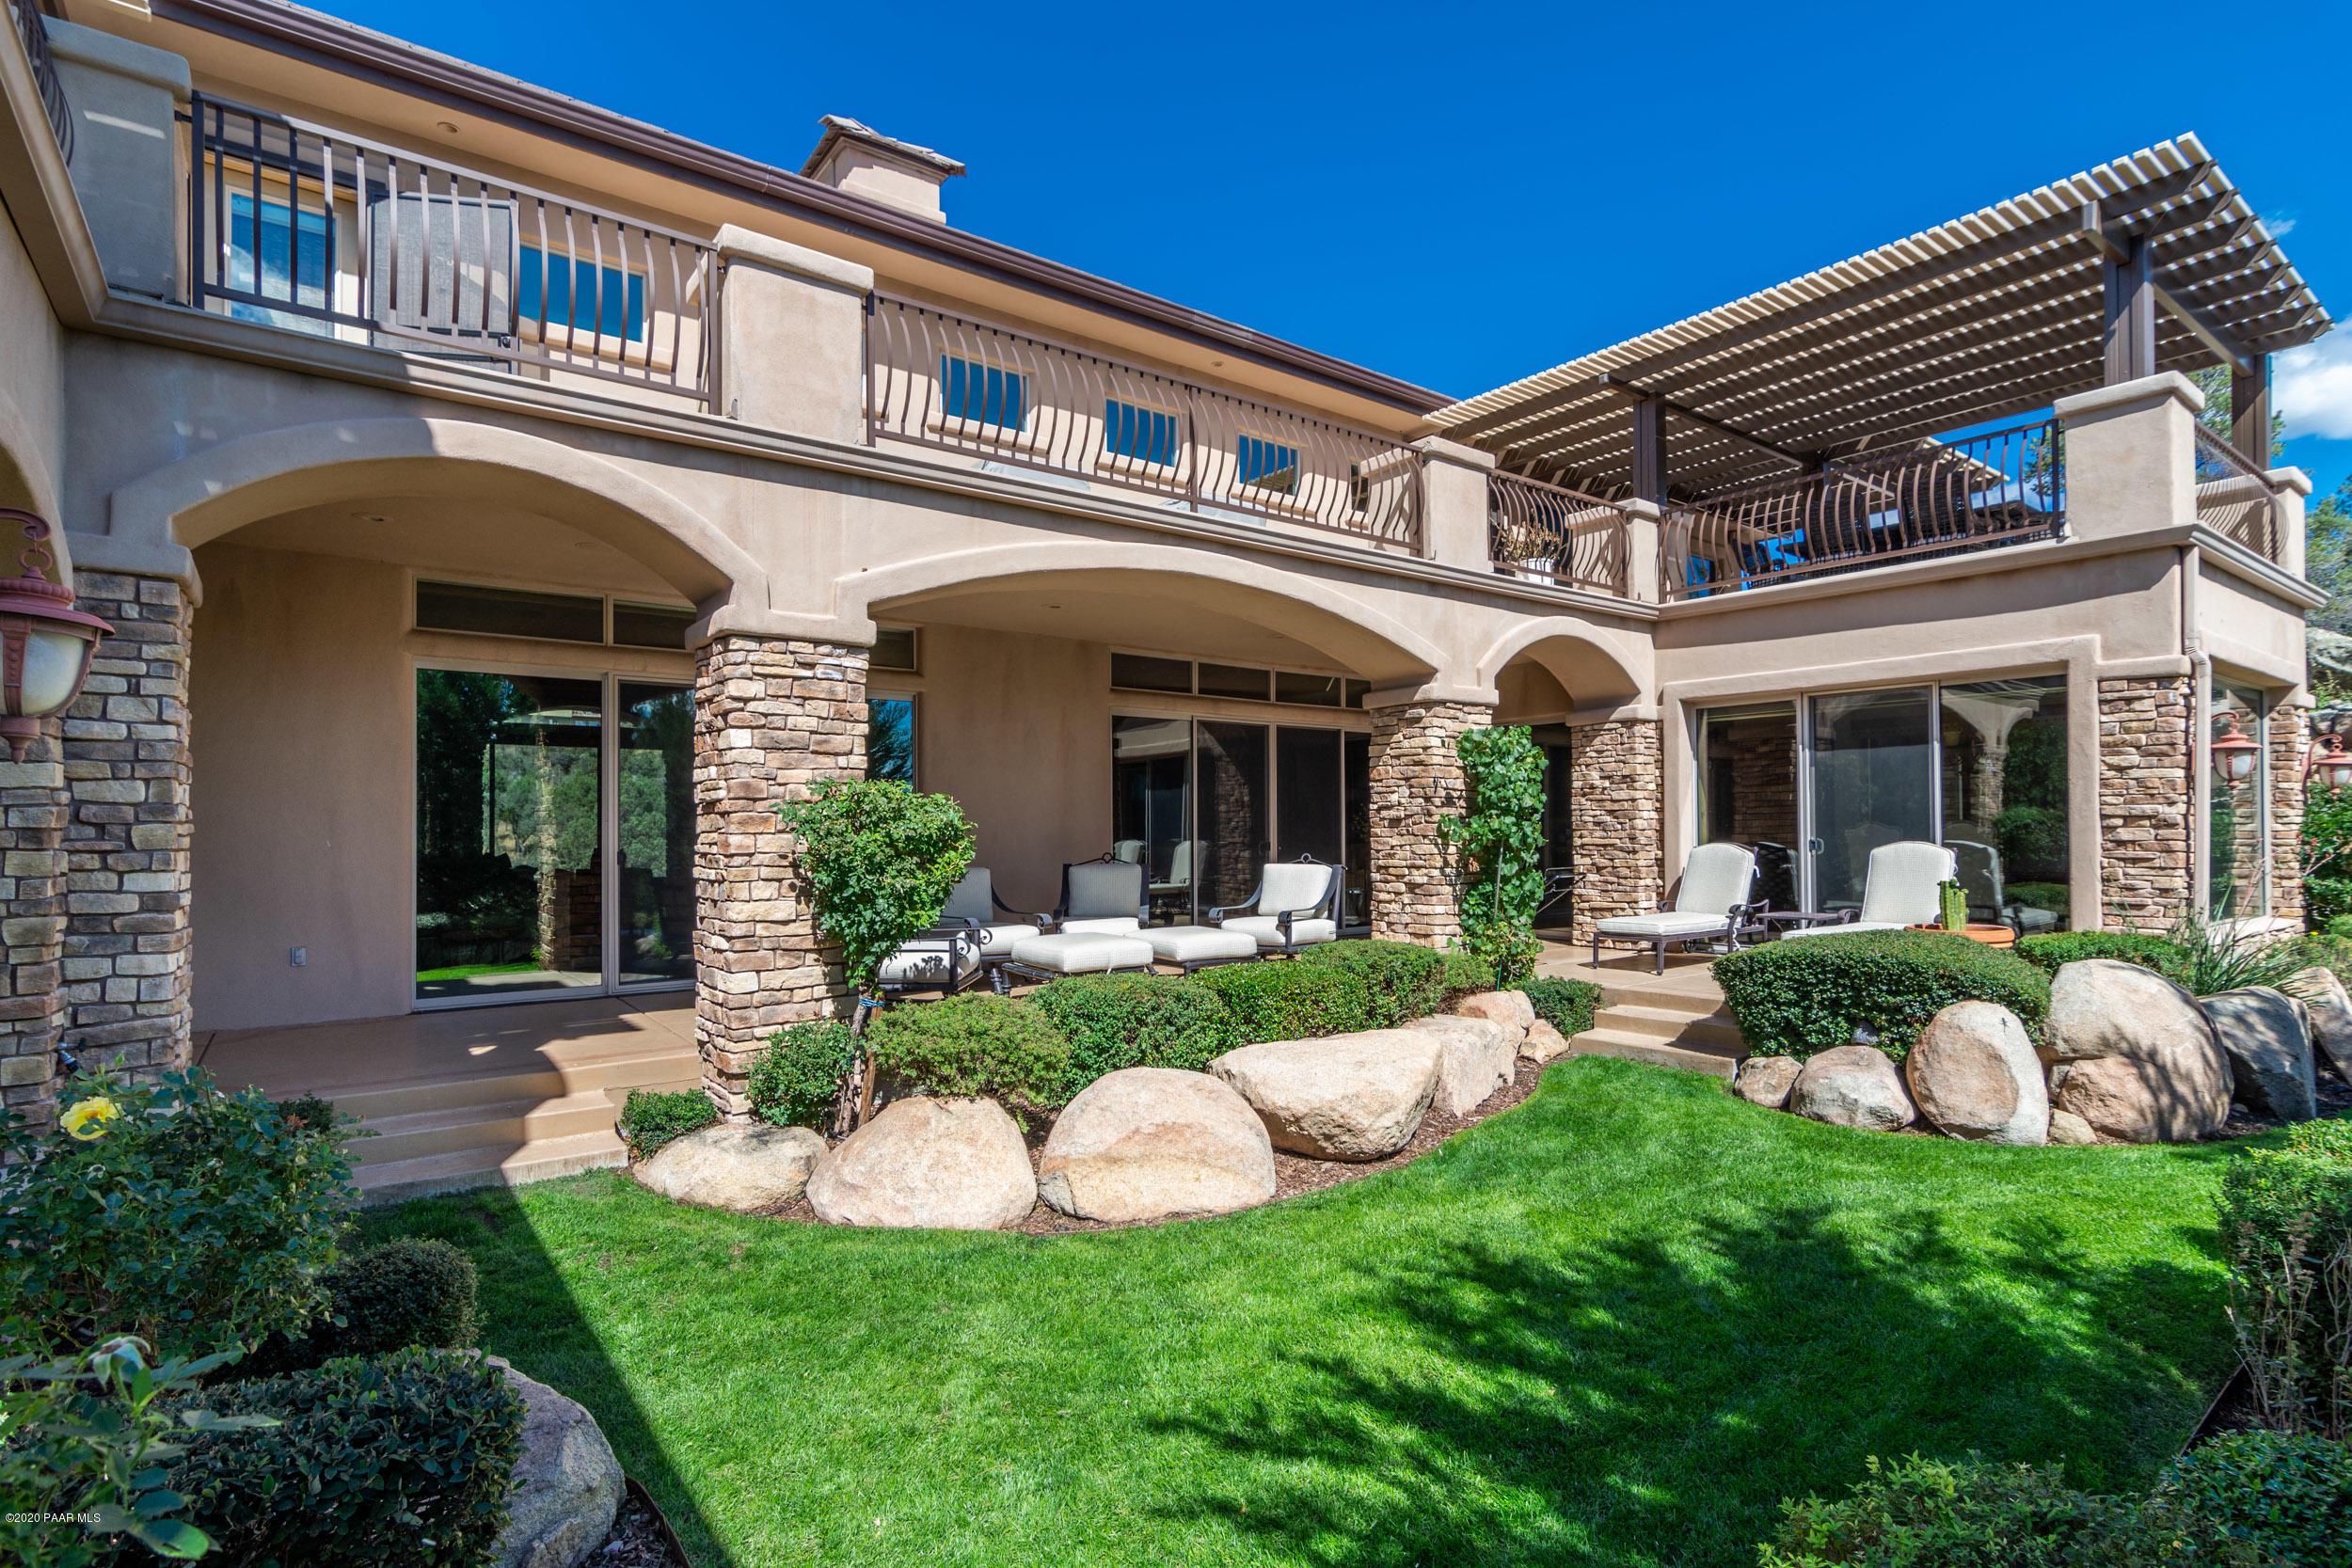 Photo of 2280 Golf Club, Prescott, AZ 86303